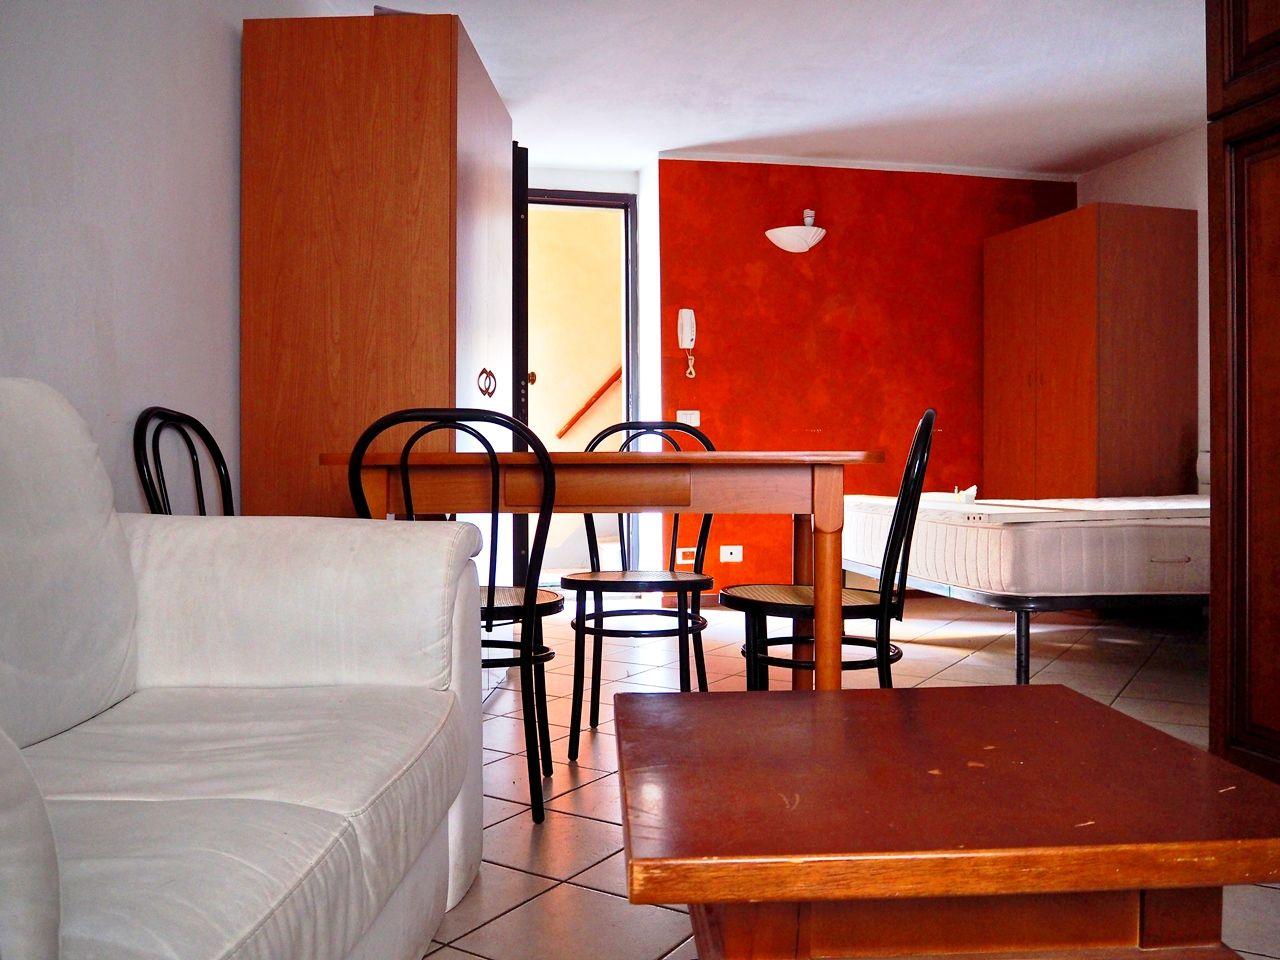 Verbania intra appartamento aa2794 case e giardini stresa for Case e giardini